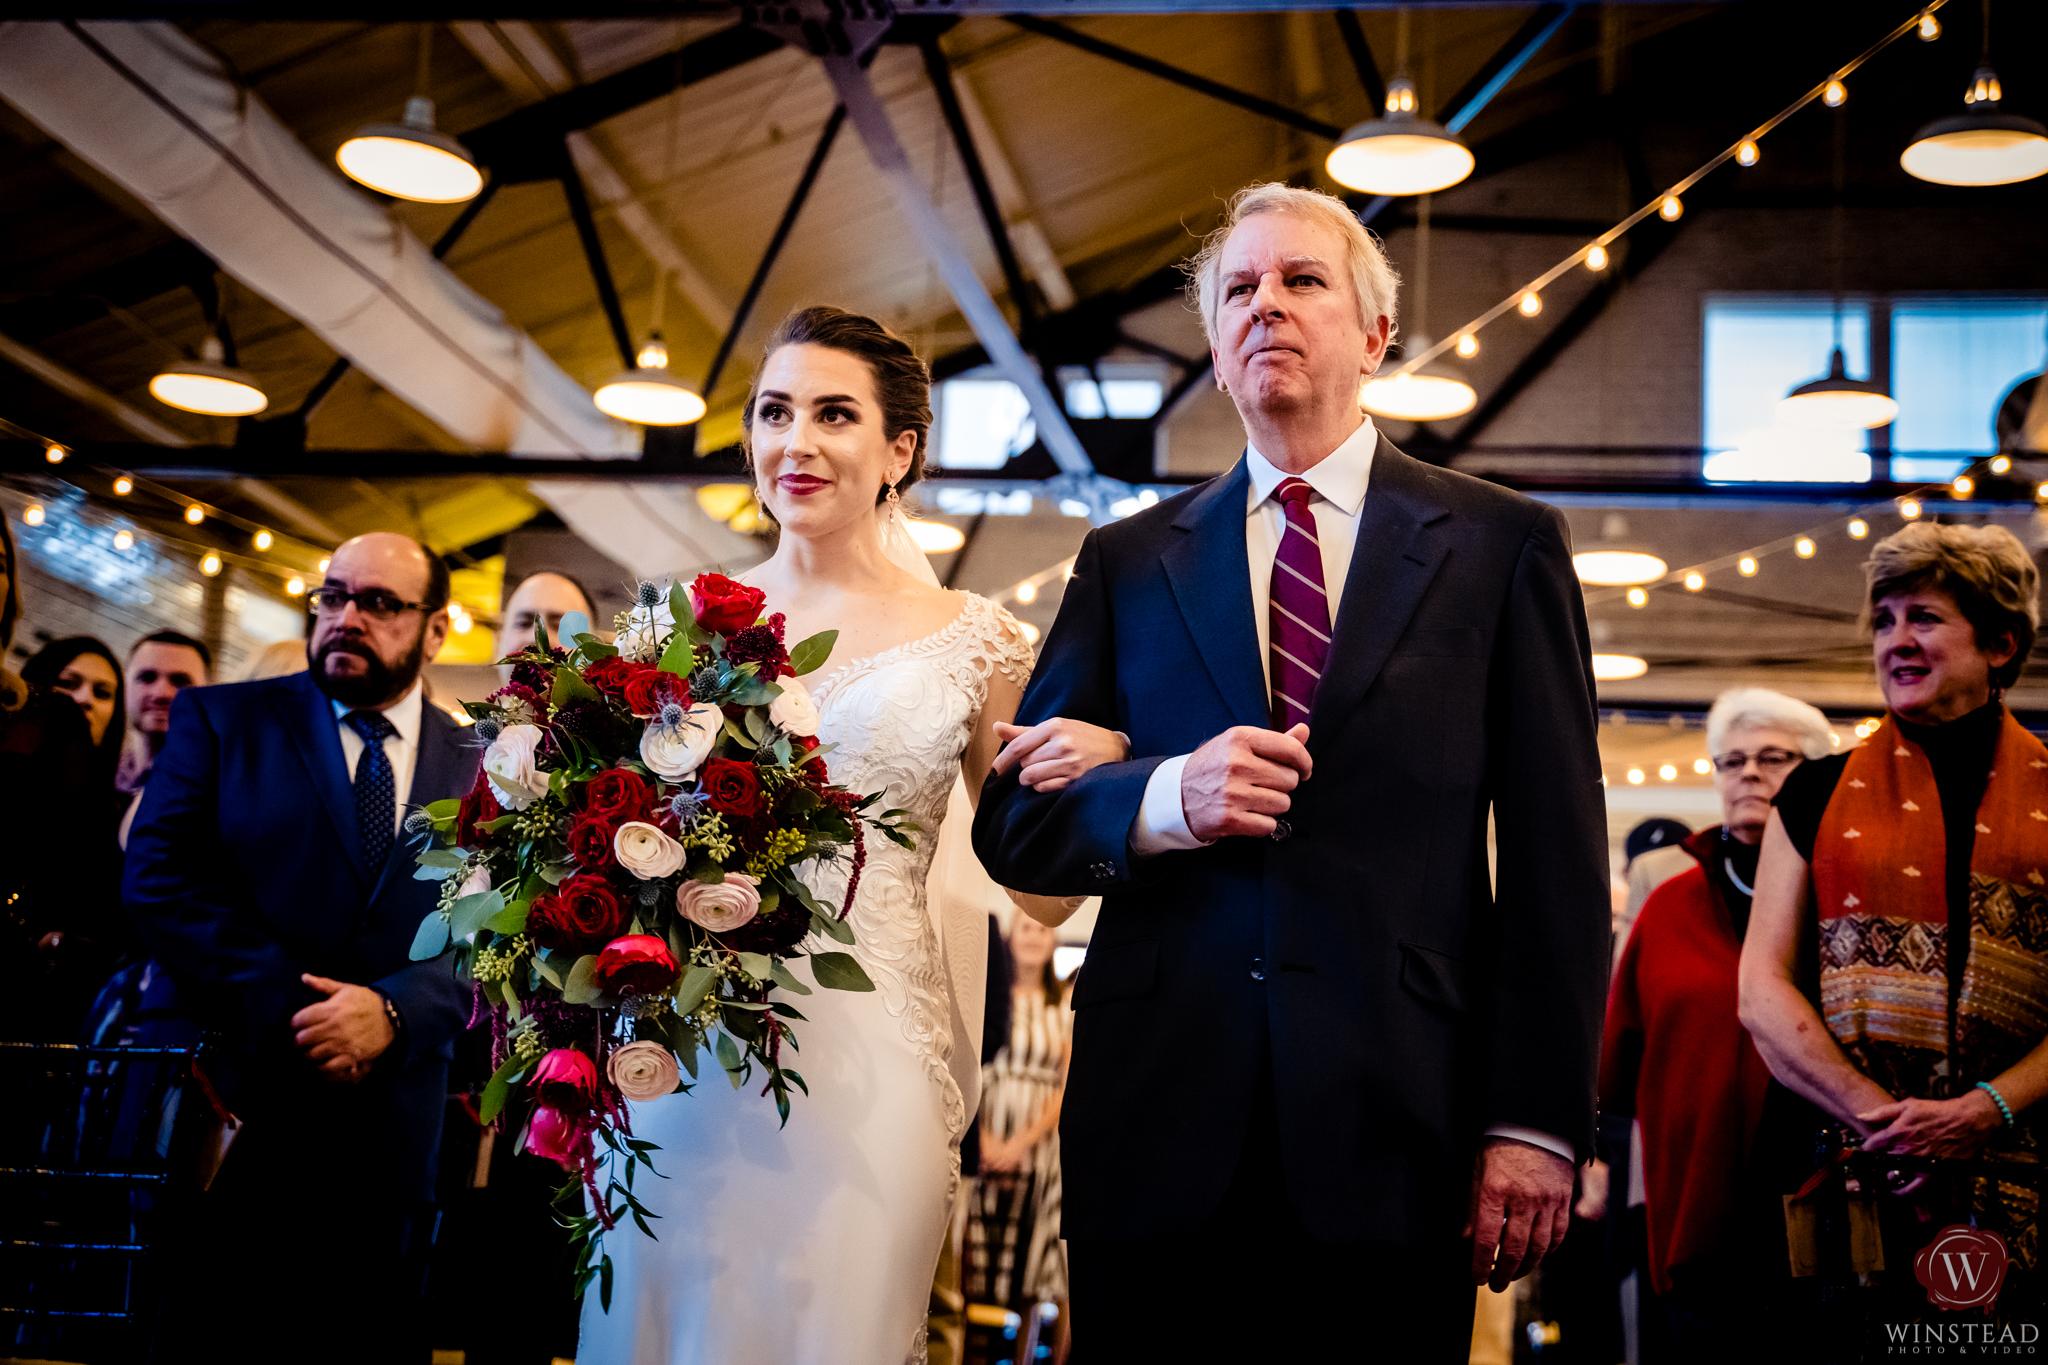 Morgan&Danny-Raleigh-Wedding-Market-Hall-52.jpg